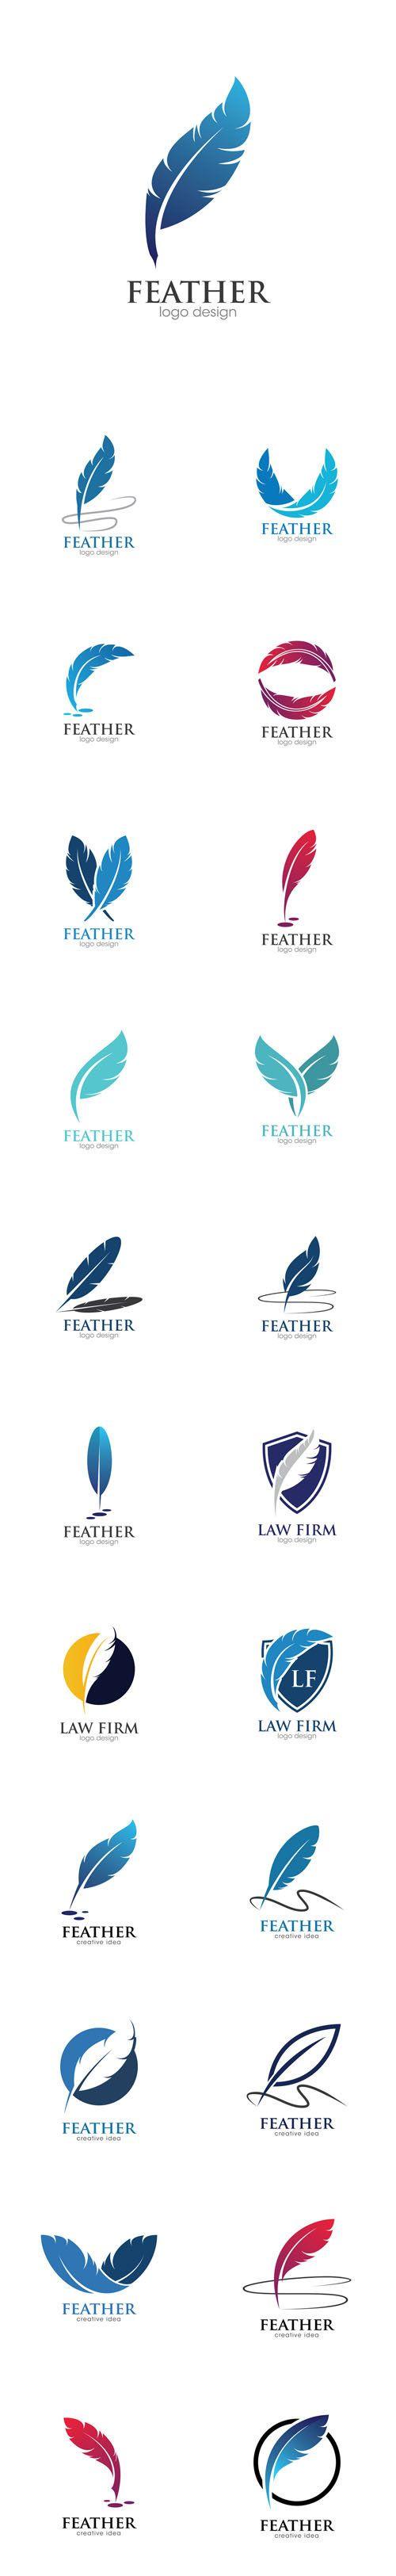 65 best Logo images on Pinterest | Chart design, Graph design and ...